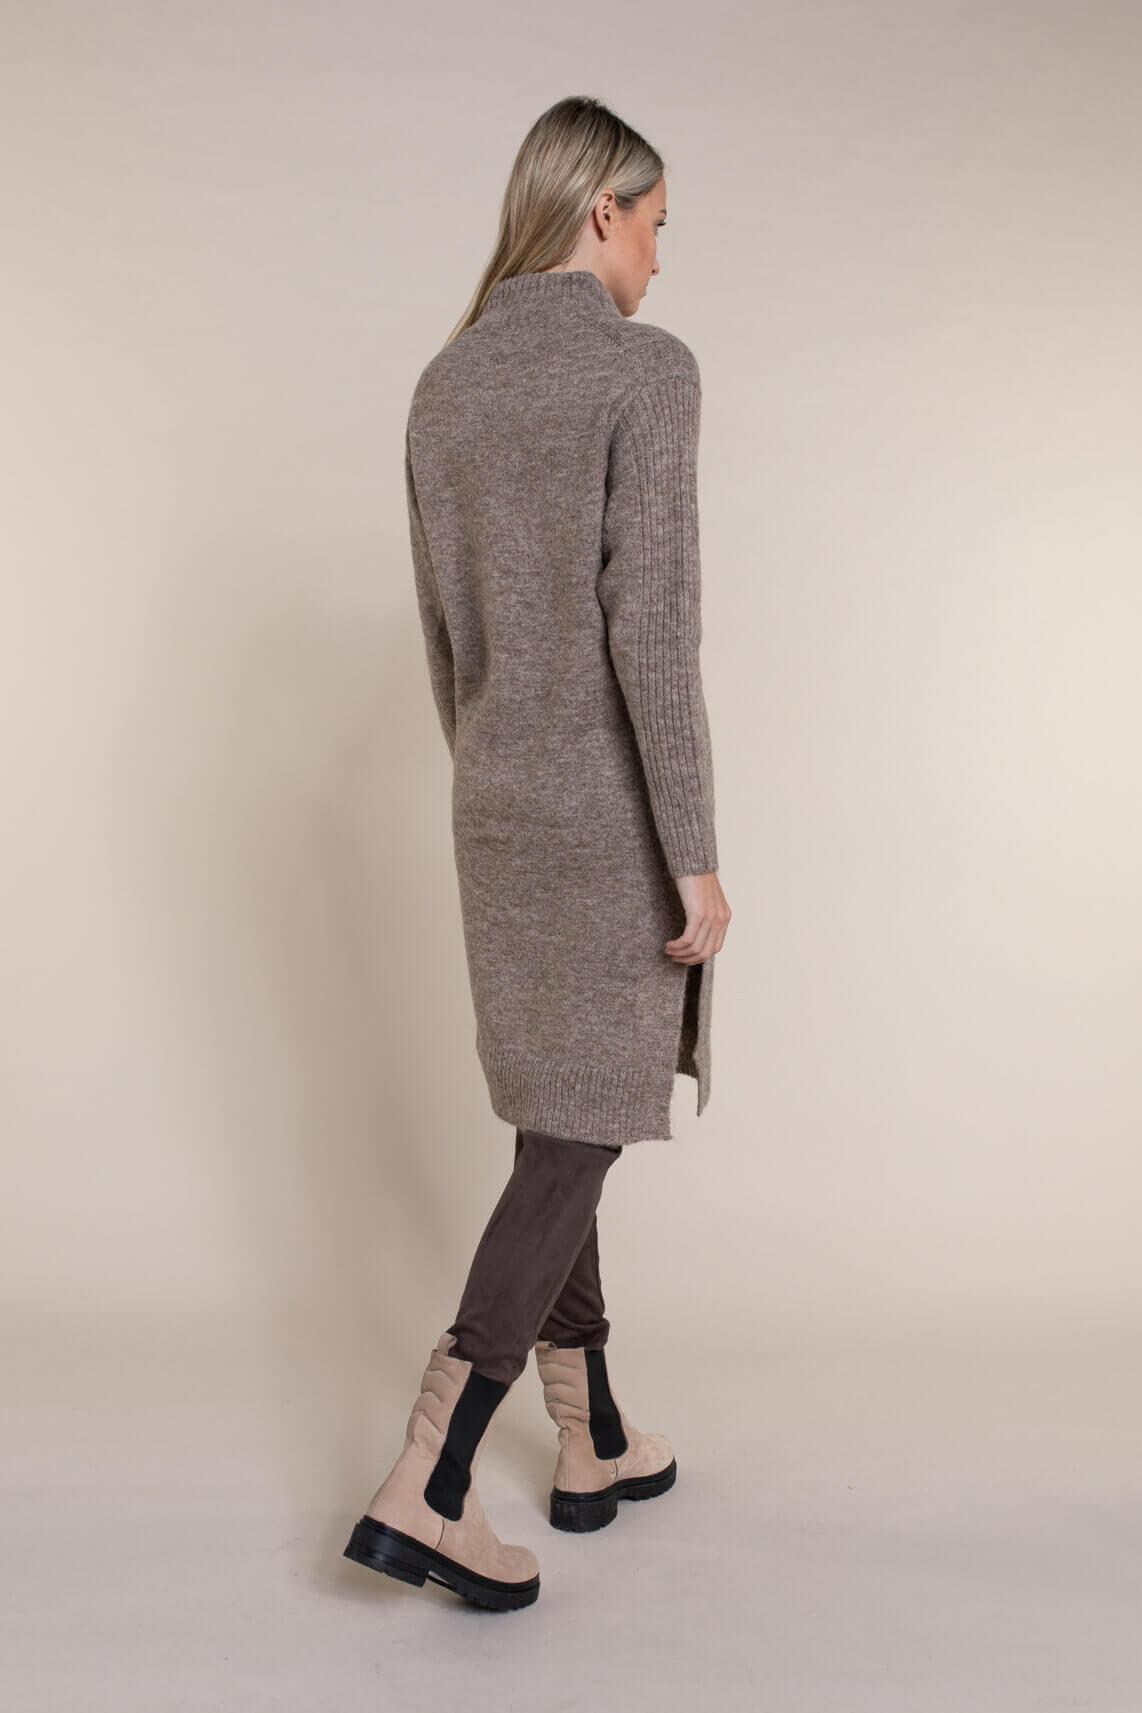 Moscow Dames Kirana jurk met wol Bruin